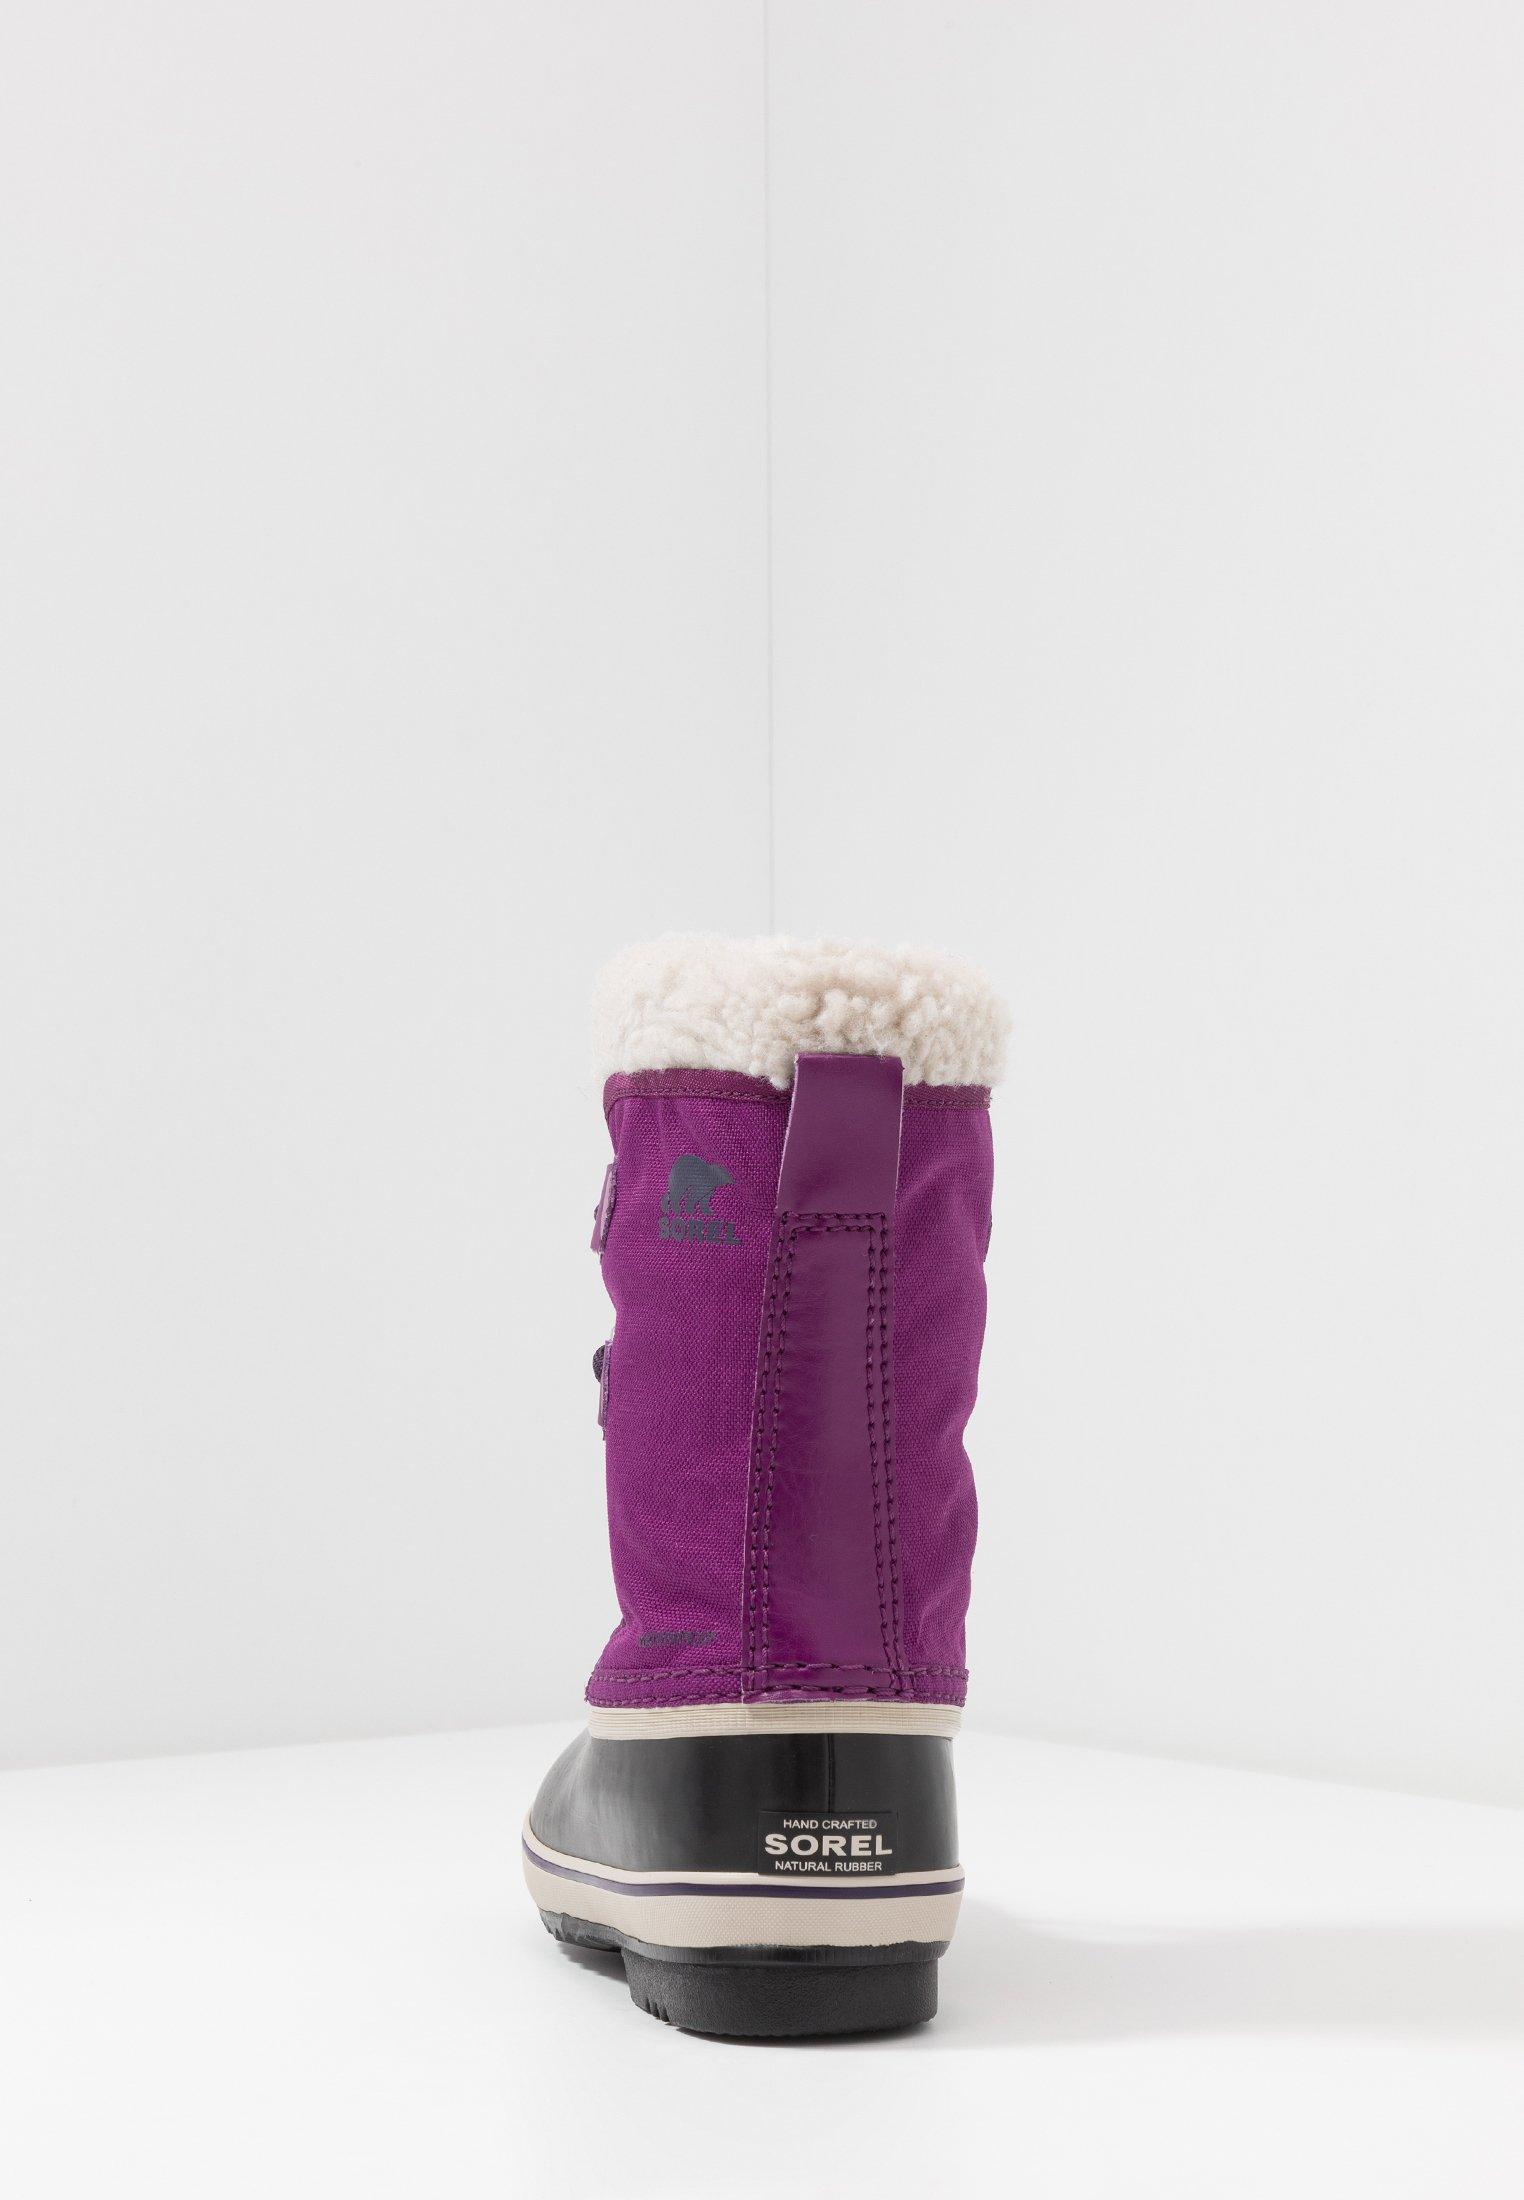 Sorel Yoot Pac - Stivali Da Neve Wild Iris/dark Plum 1qWJkLi